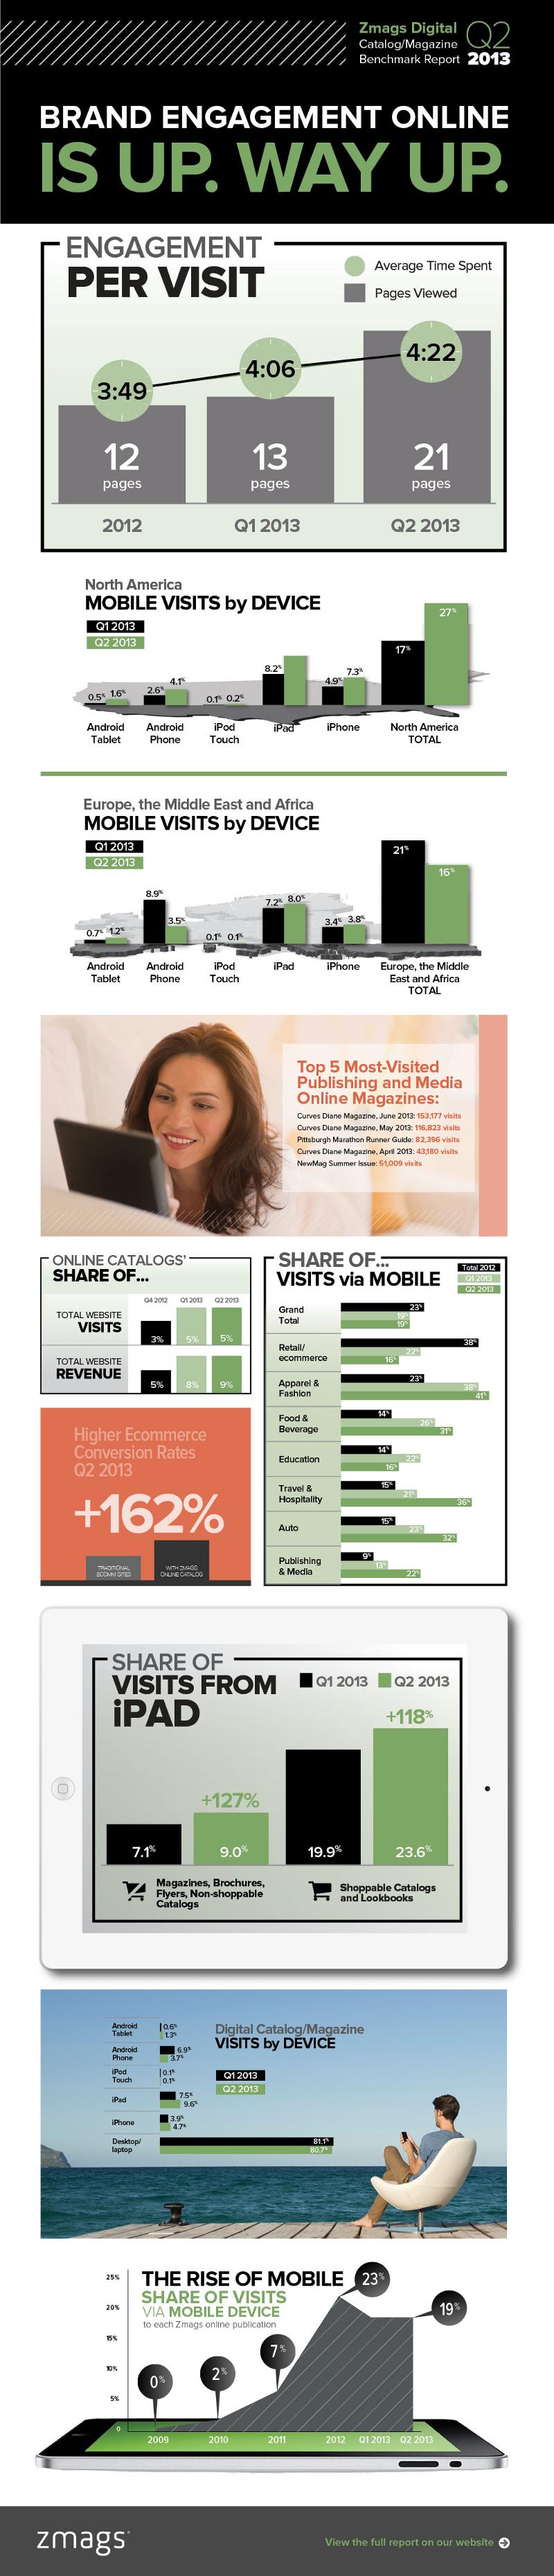 Magazine Statistics and Trends